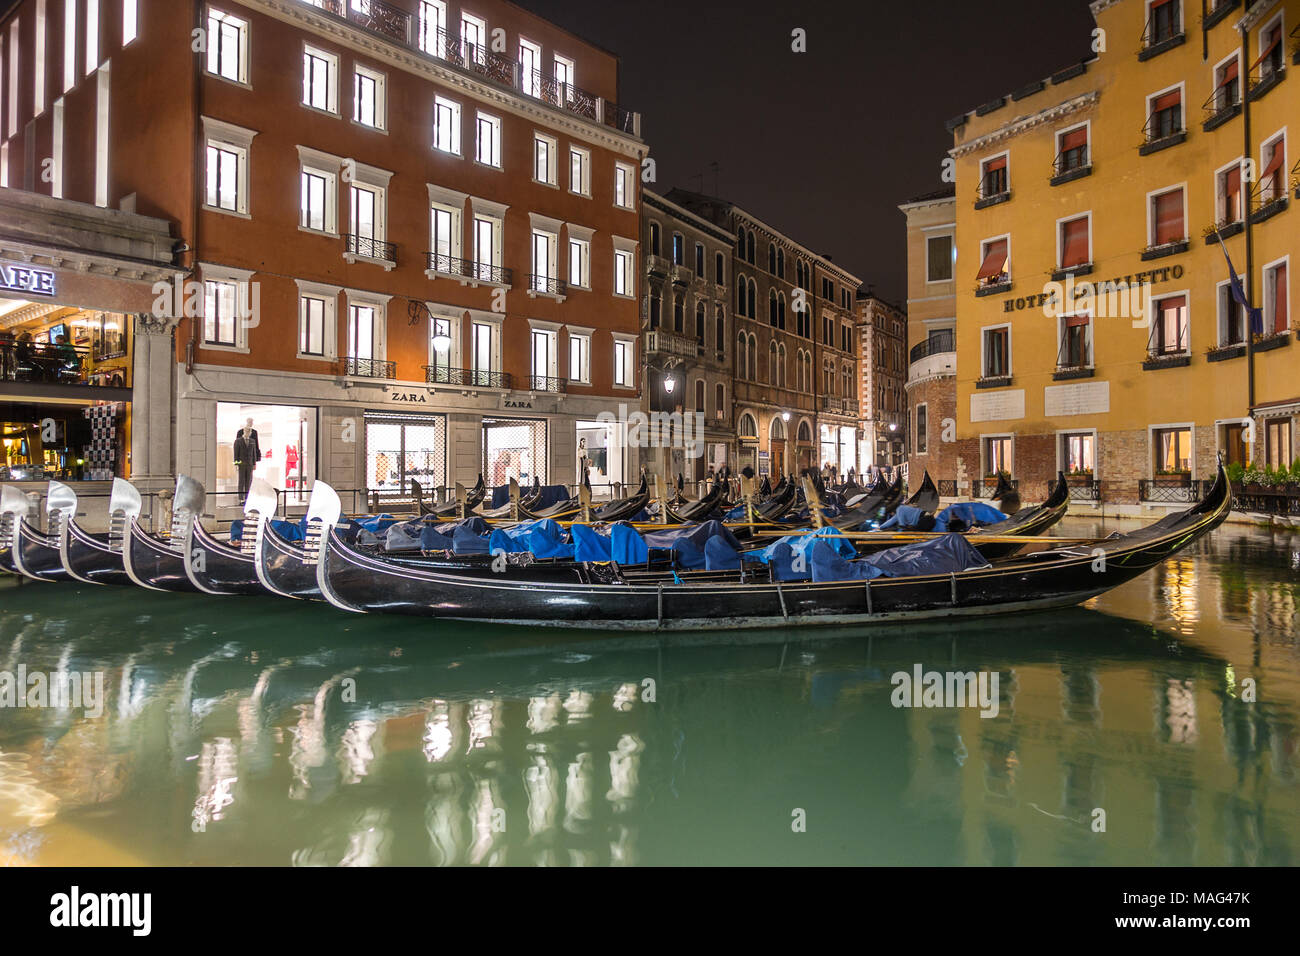 Bacino Orseolo in Venice - Stock Image